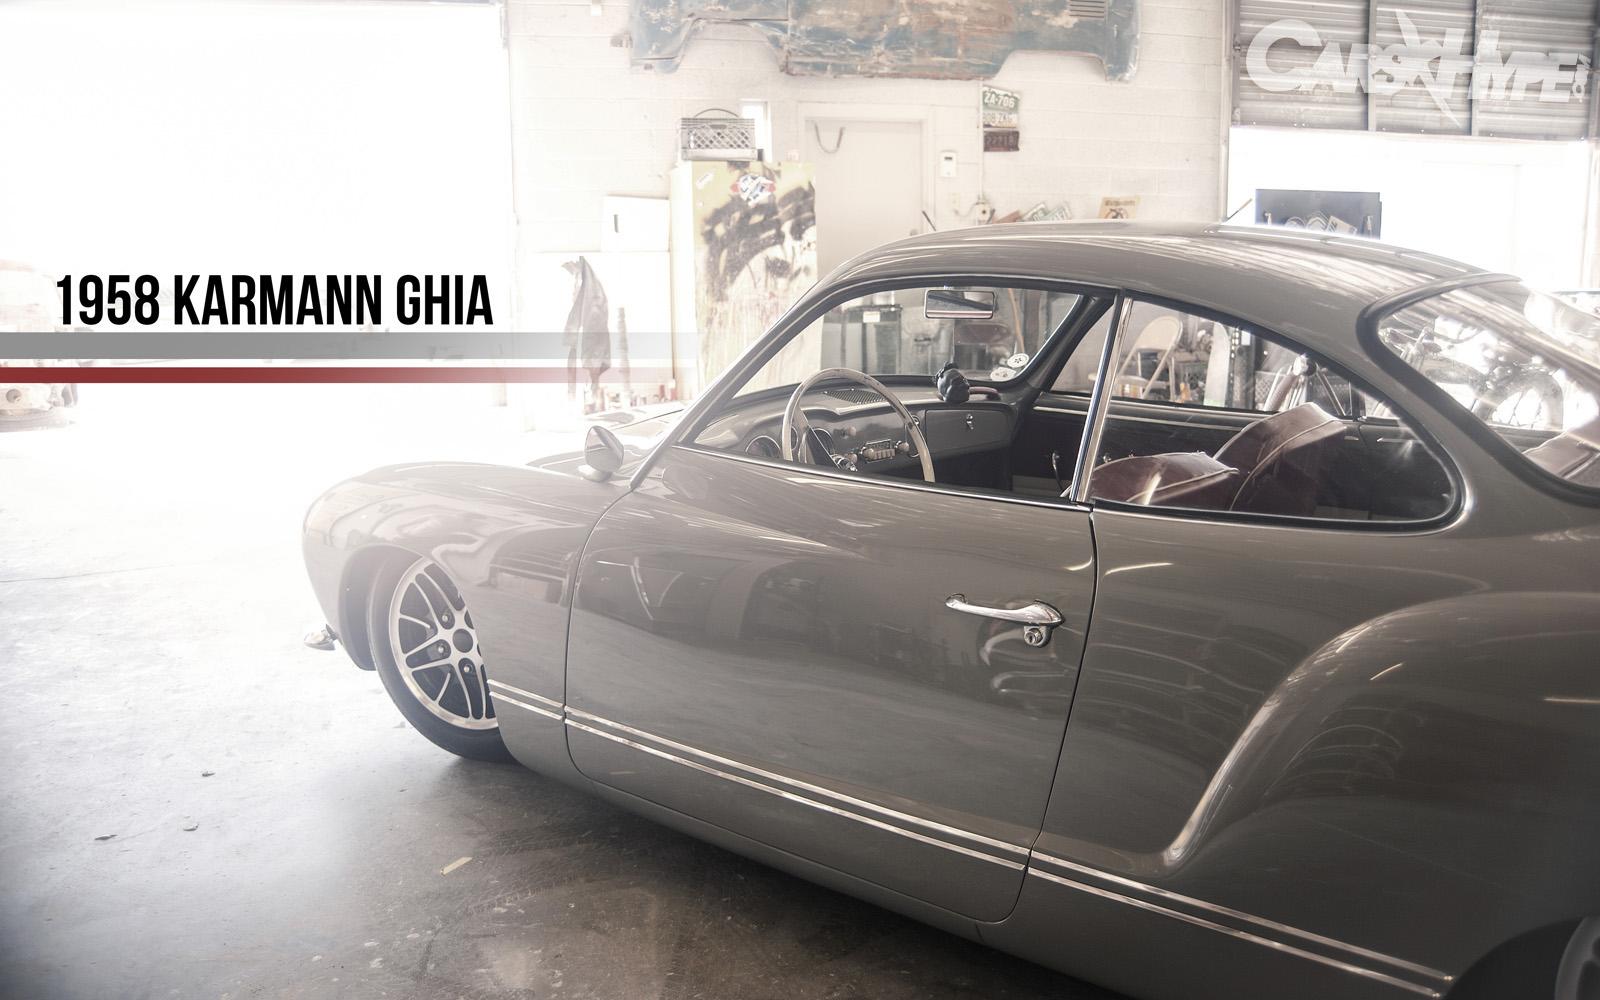 Meet Jacob Tobeyu0027s 1958 Volkswagen Karmann Ghia. Heu0027s had this lovely lowlight ... & CarsHype.com   Lowlight in the Spotlight: Jakeu0027s u002758 Ghia